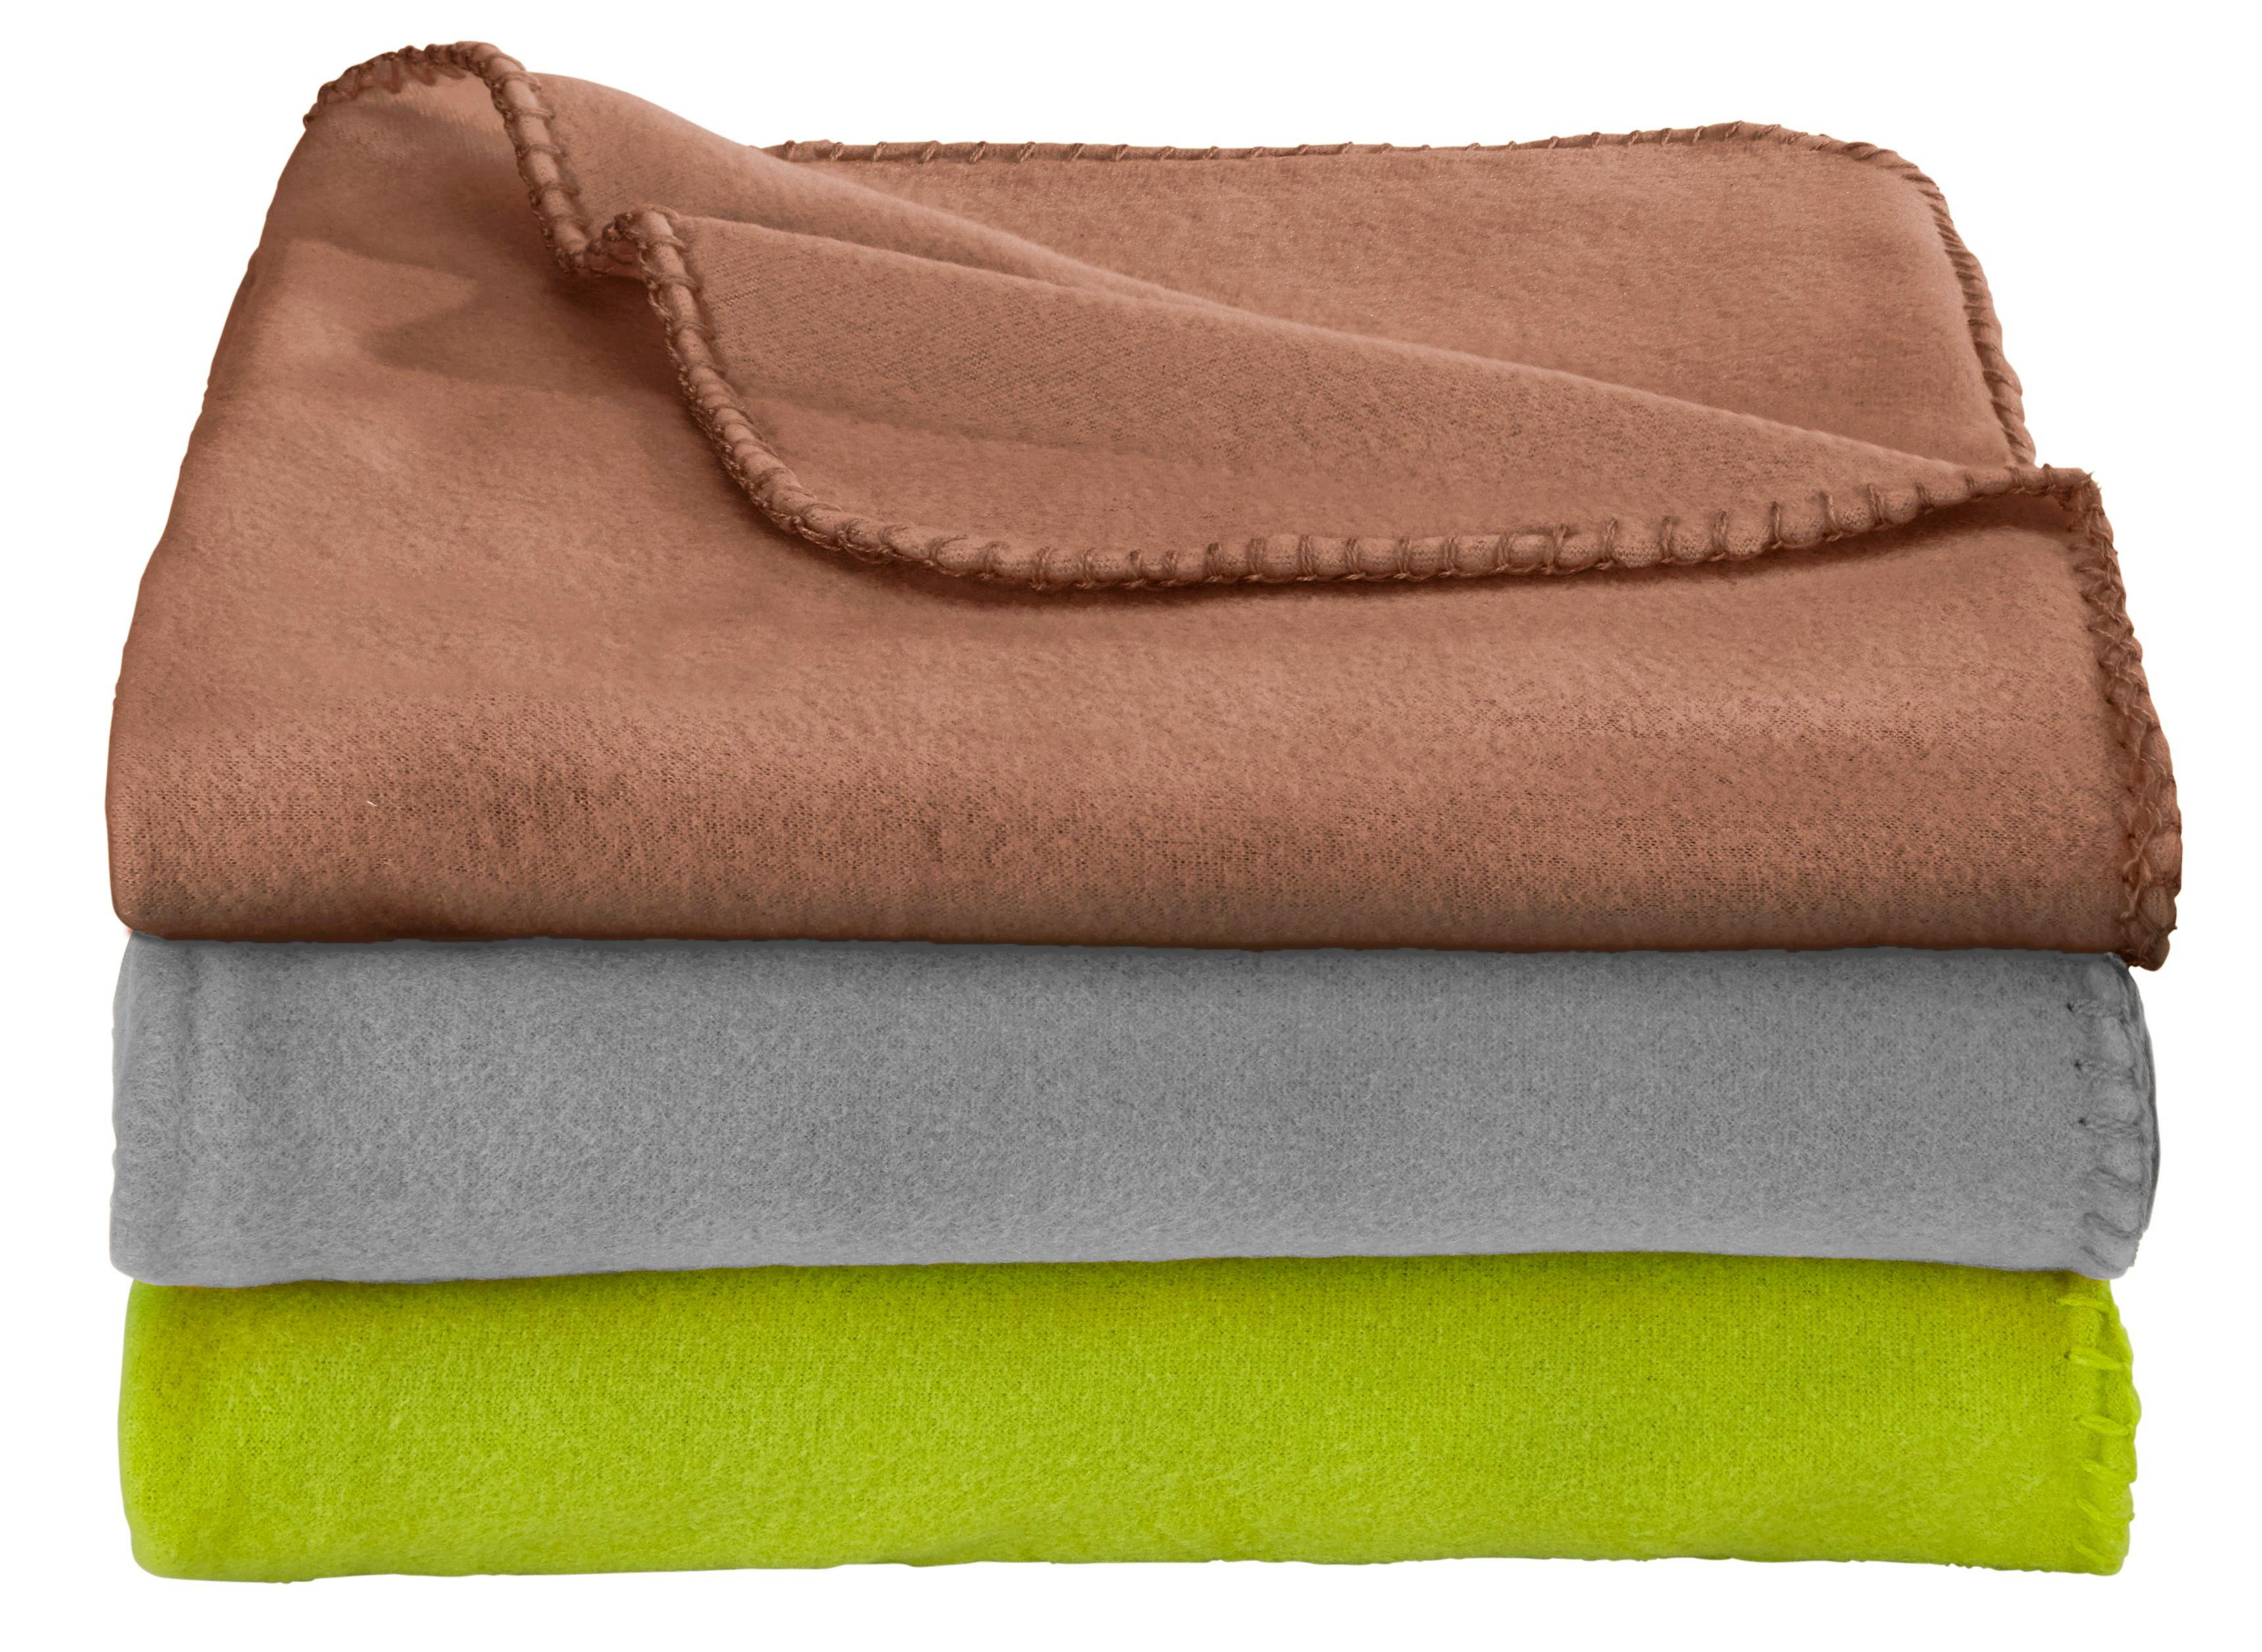 Fleecedecke Trixi in Braun/grau/grün - Braun/Grau, Textil (130/160cm) - BASED